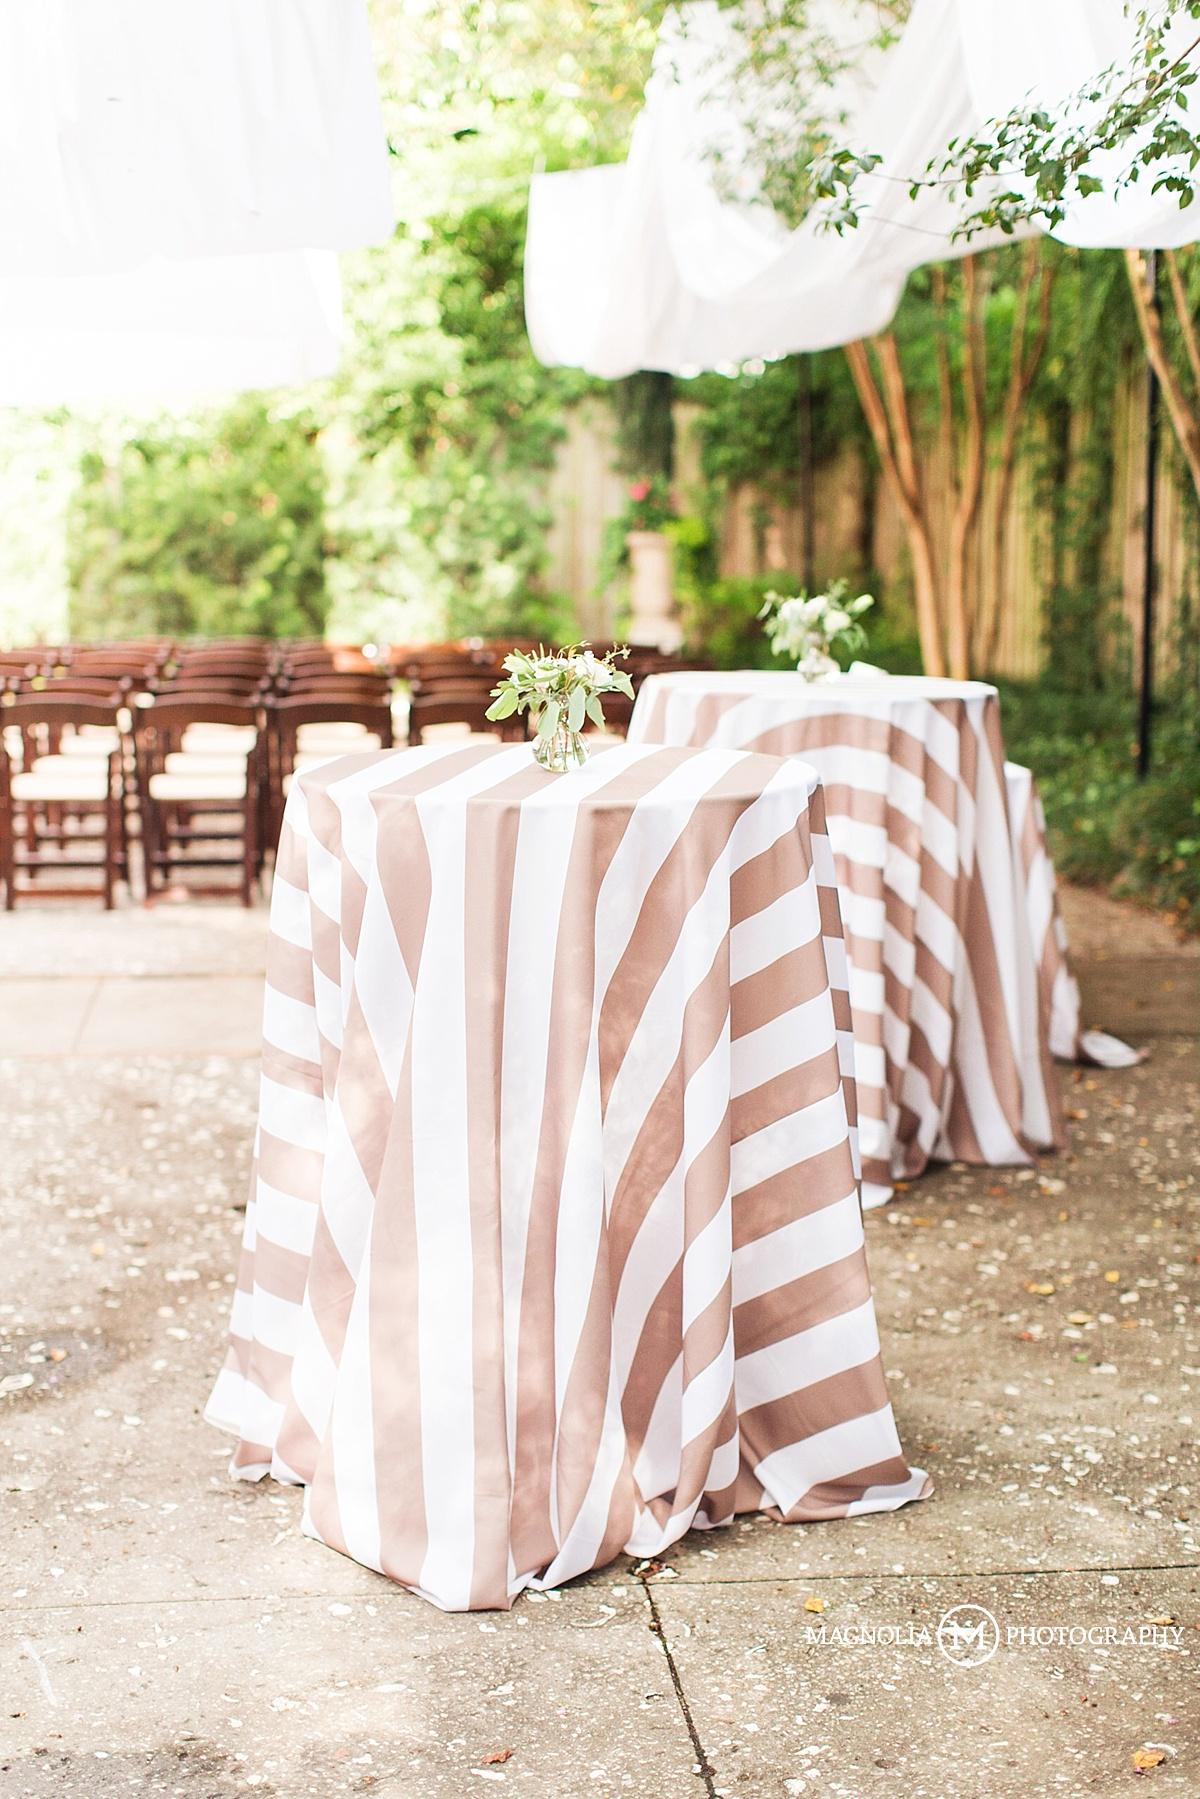 weddings at brooklyn arts center-23-1